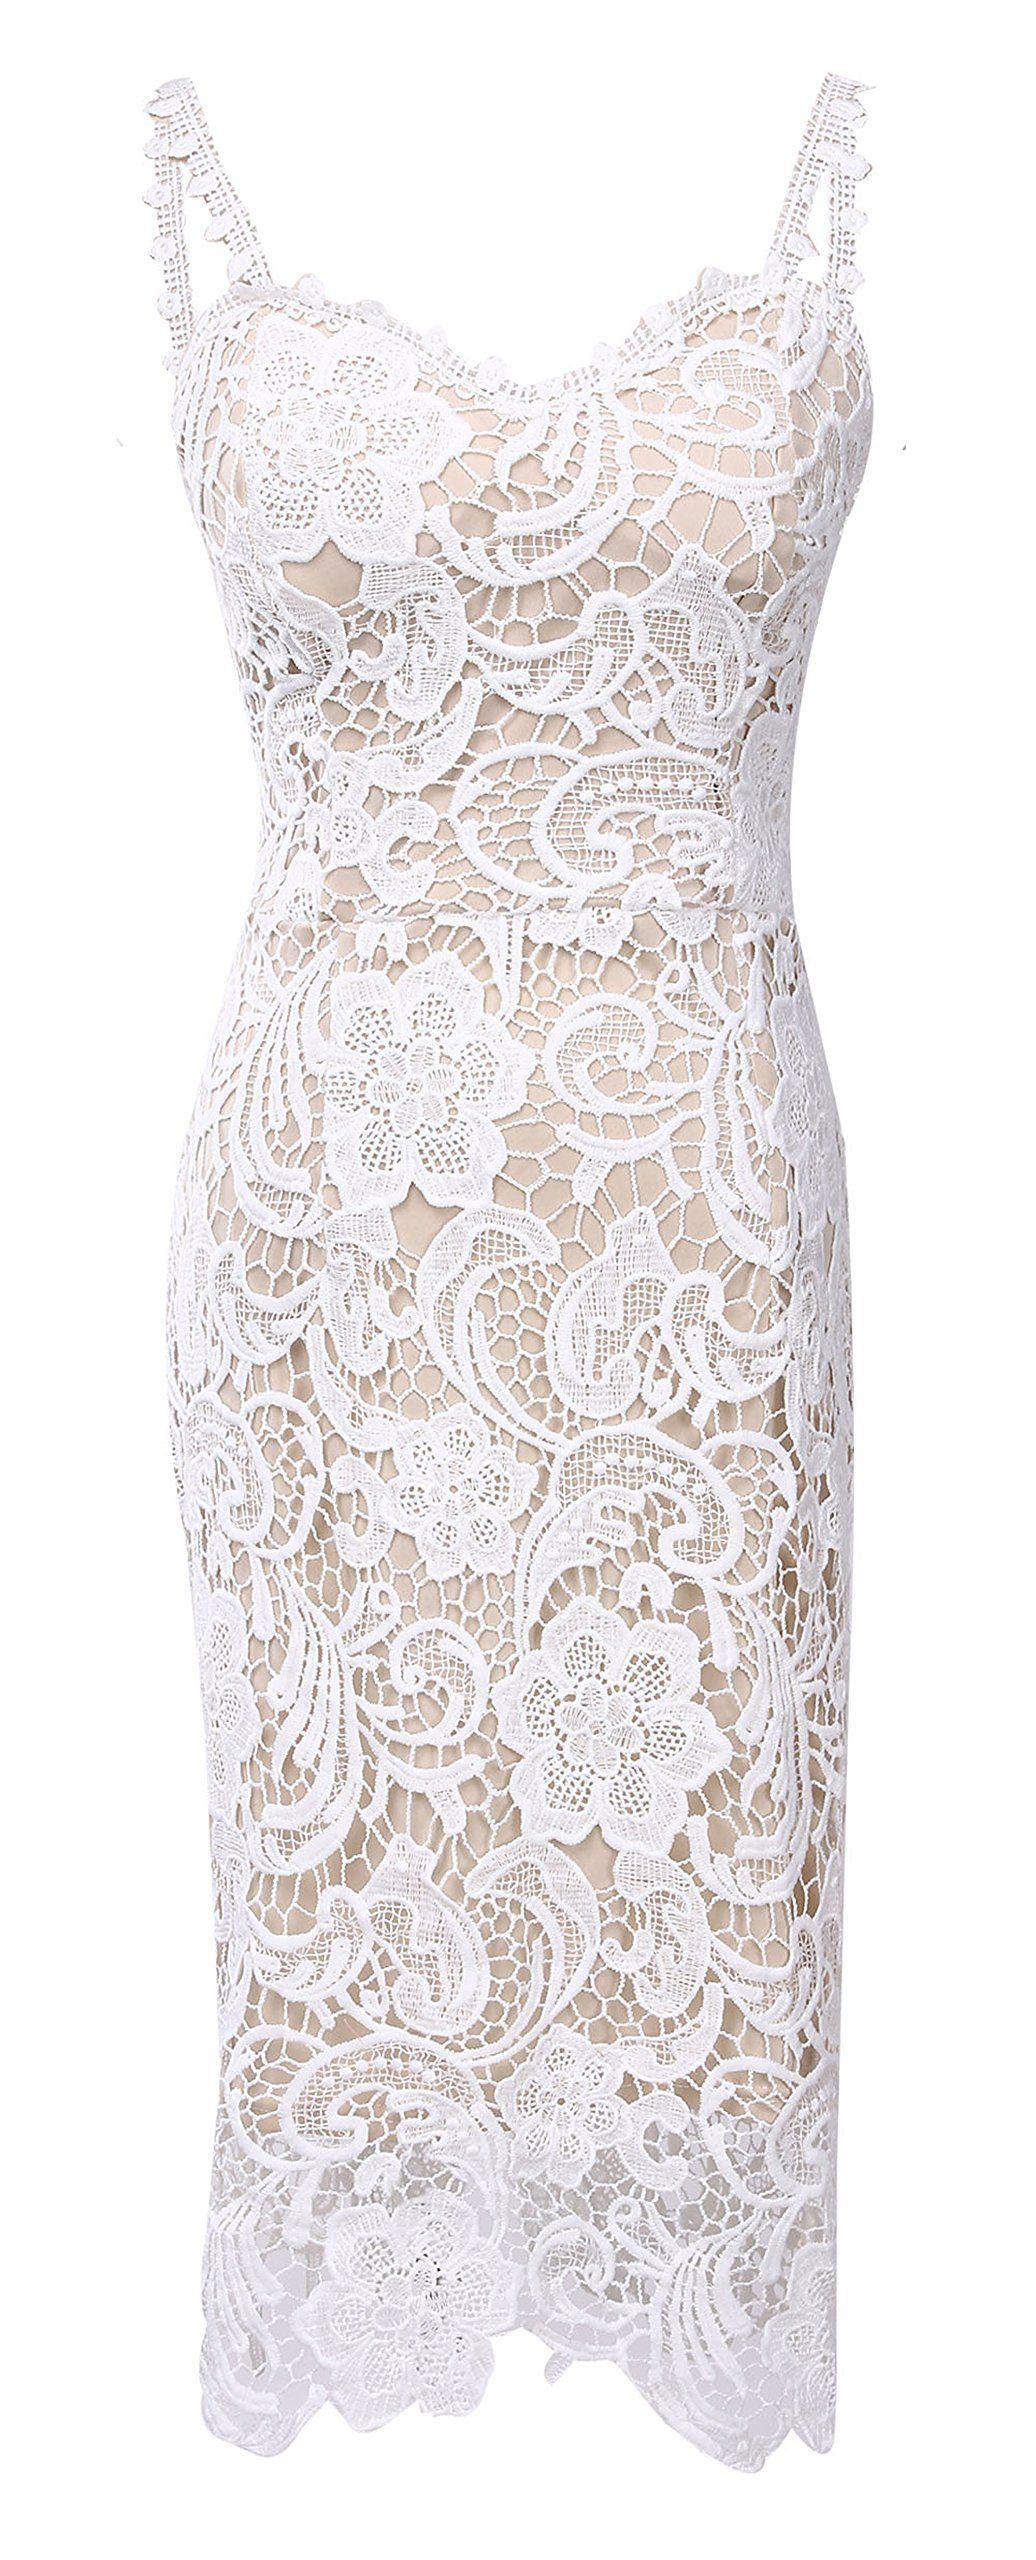 6a7c8e2e41 Women Elegant Sweetheart Neck Lace Crochet Midi Bodycon Sheath Waist Dress  White XL